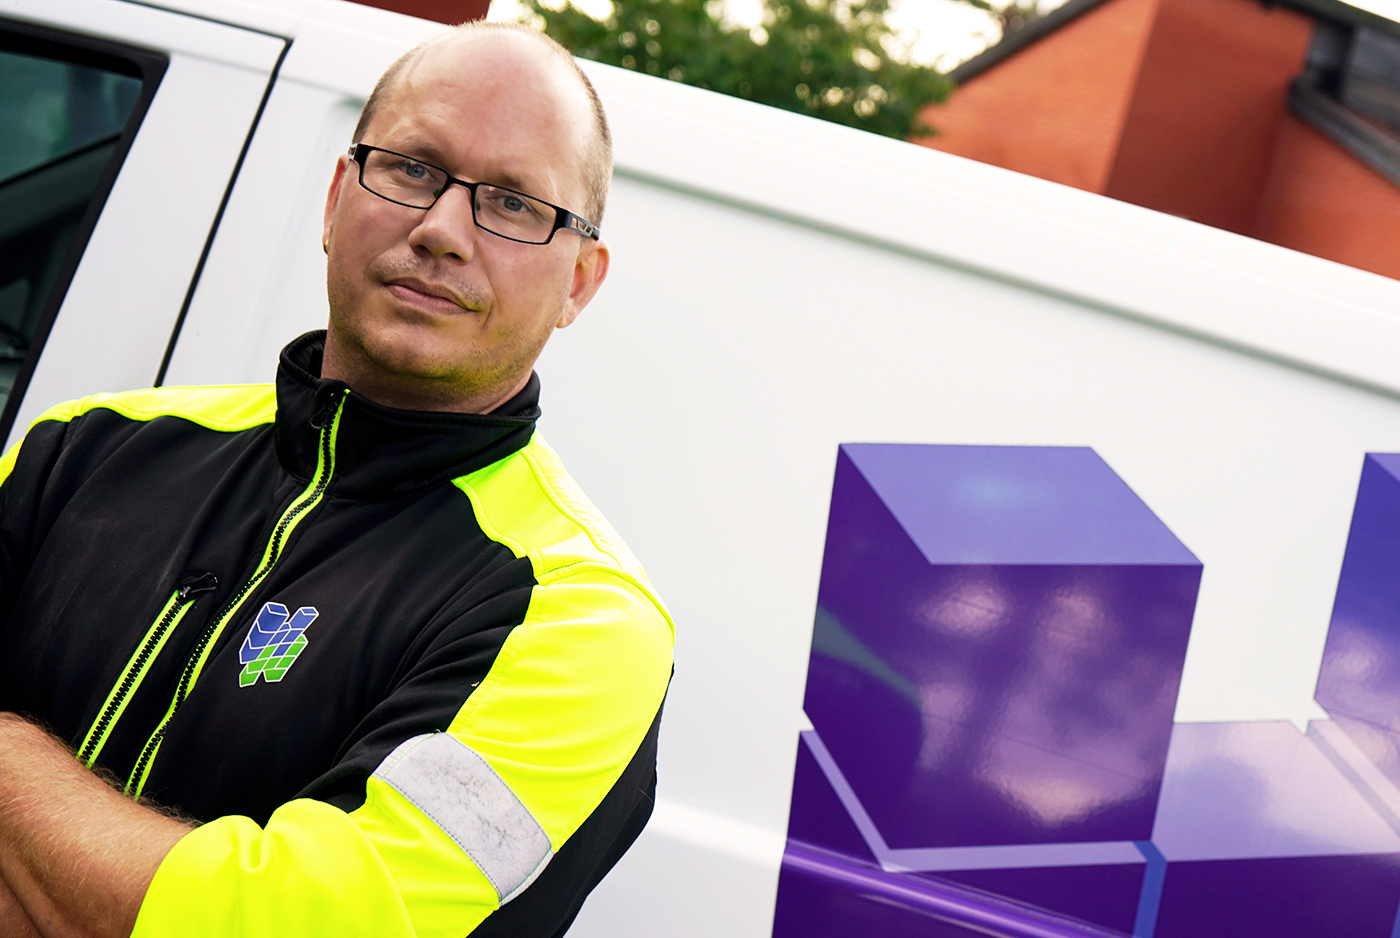 Byggservice - Heving & Hägglund